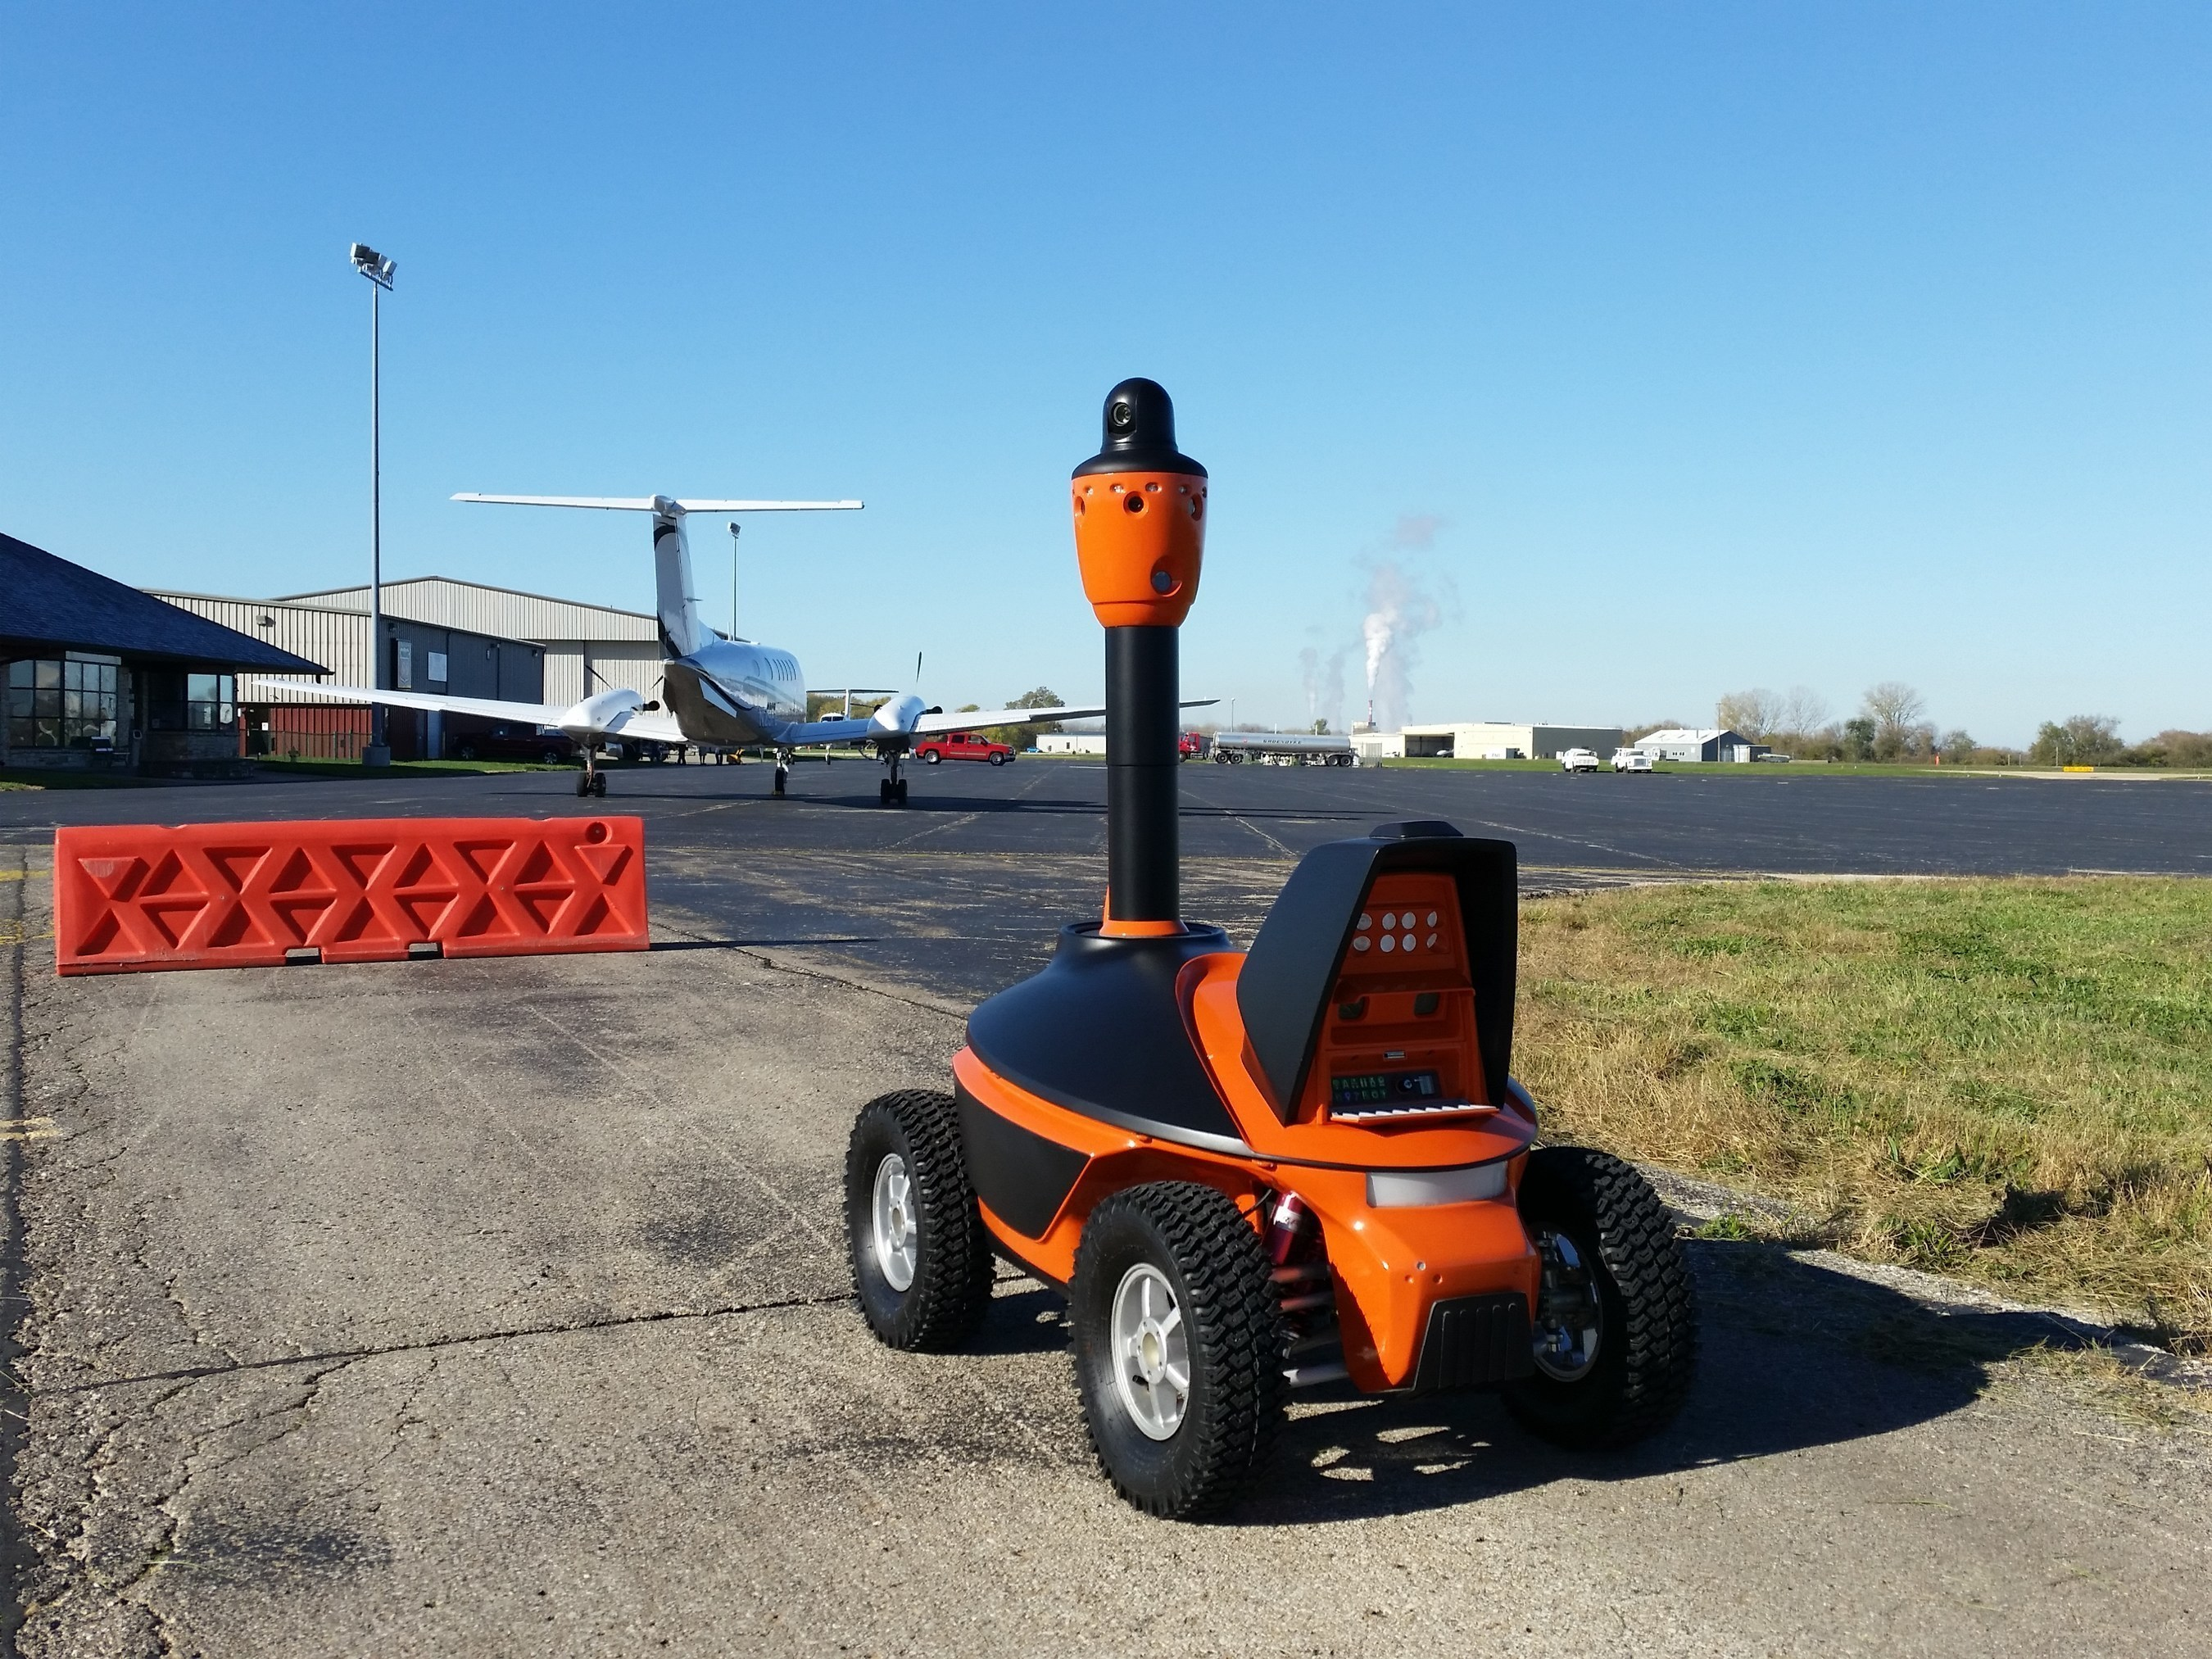 S5 Security Robot by SMP Robotics